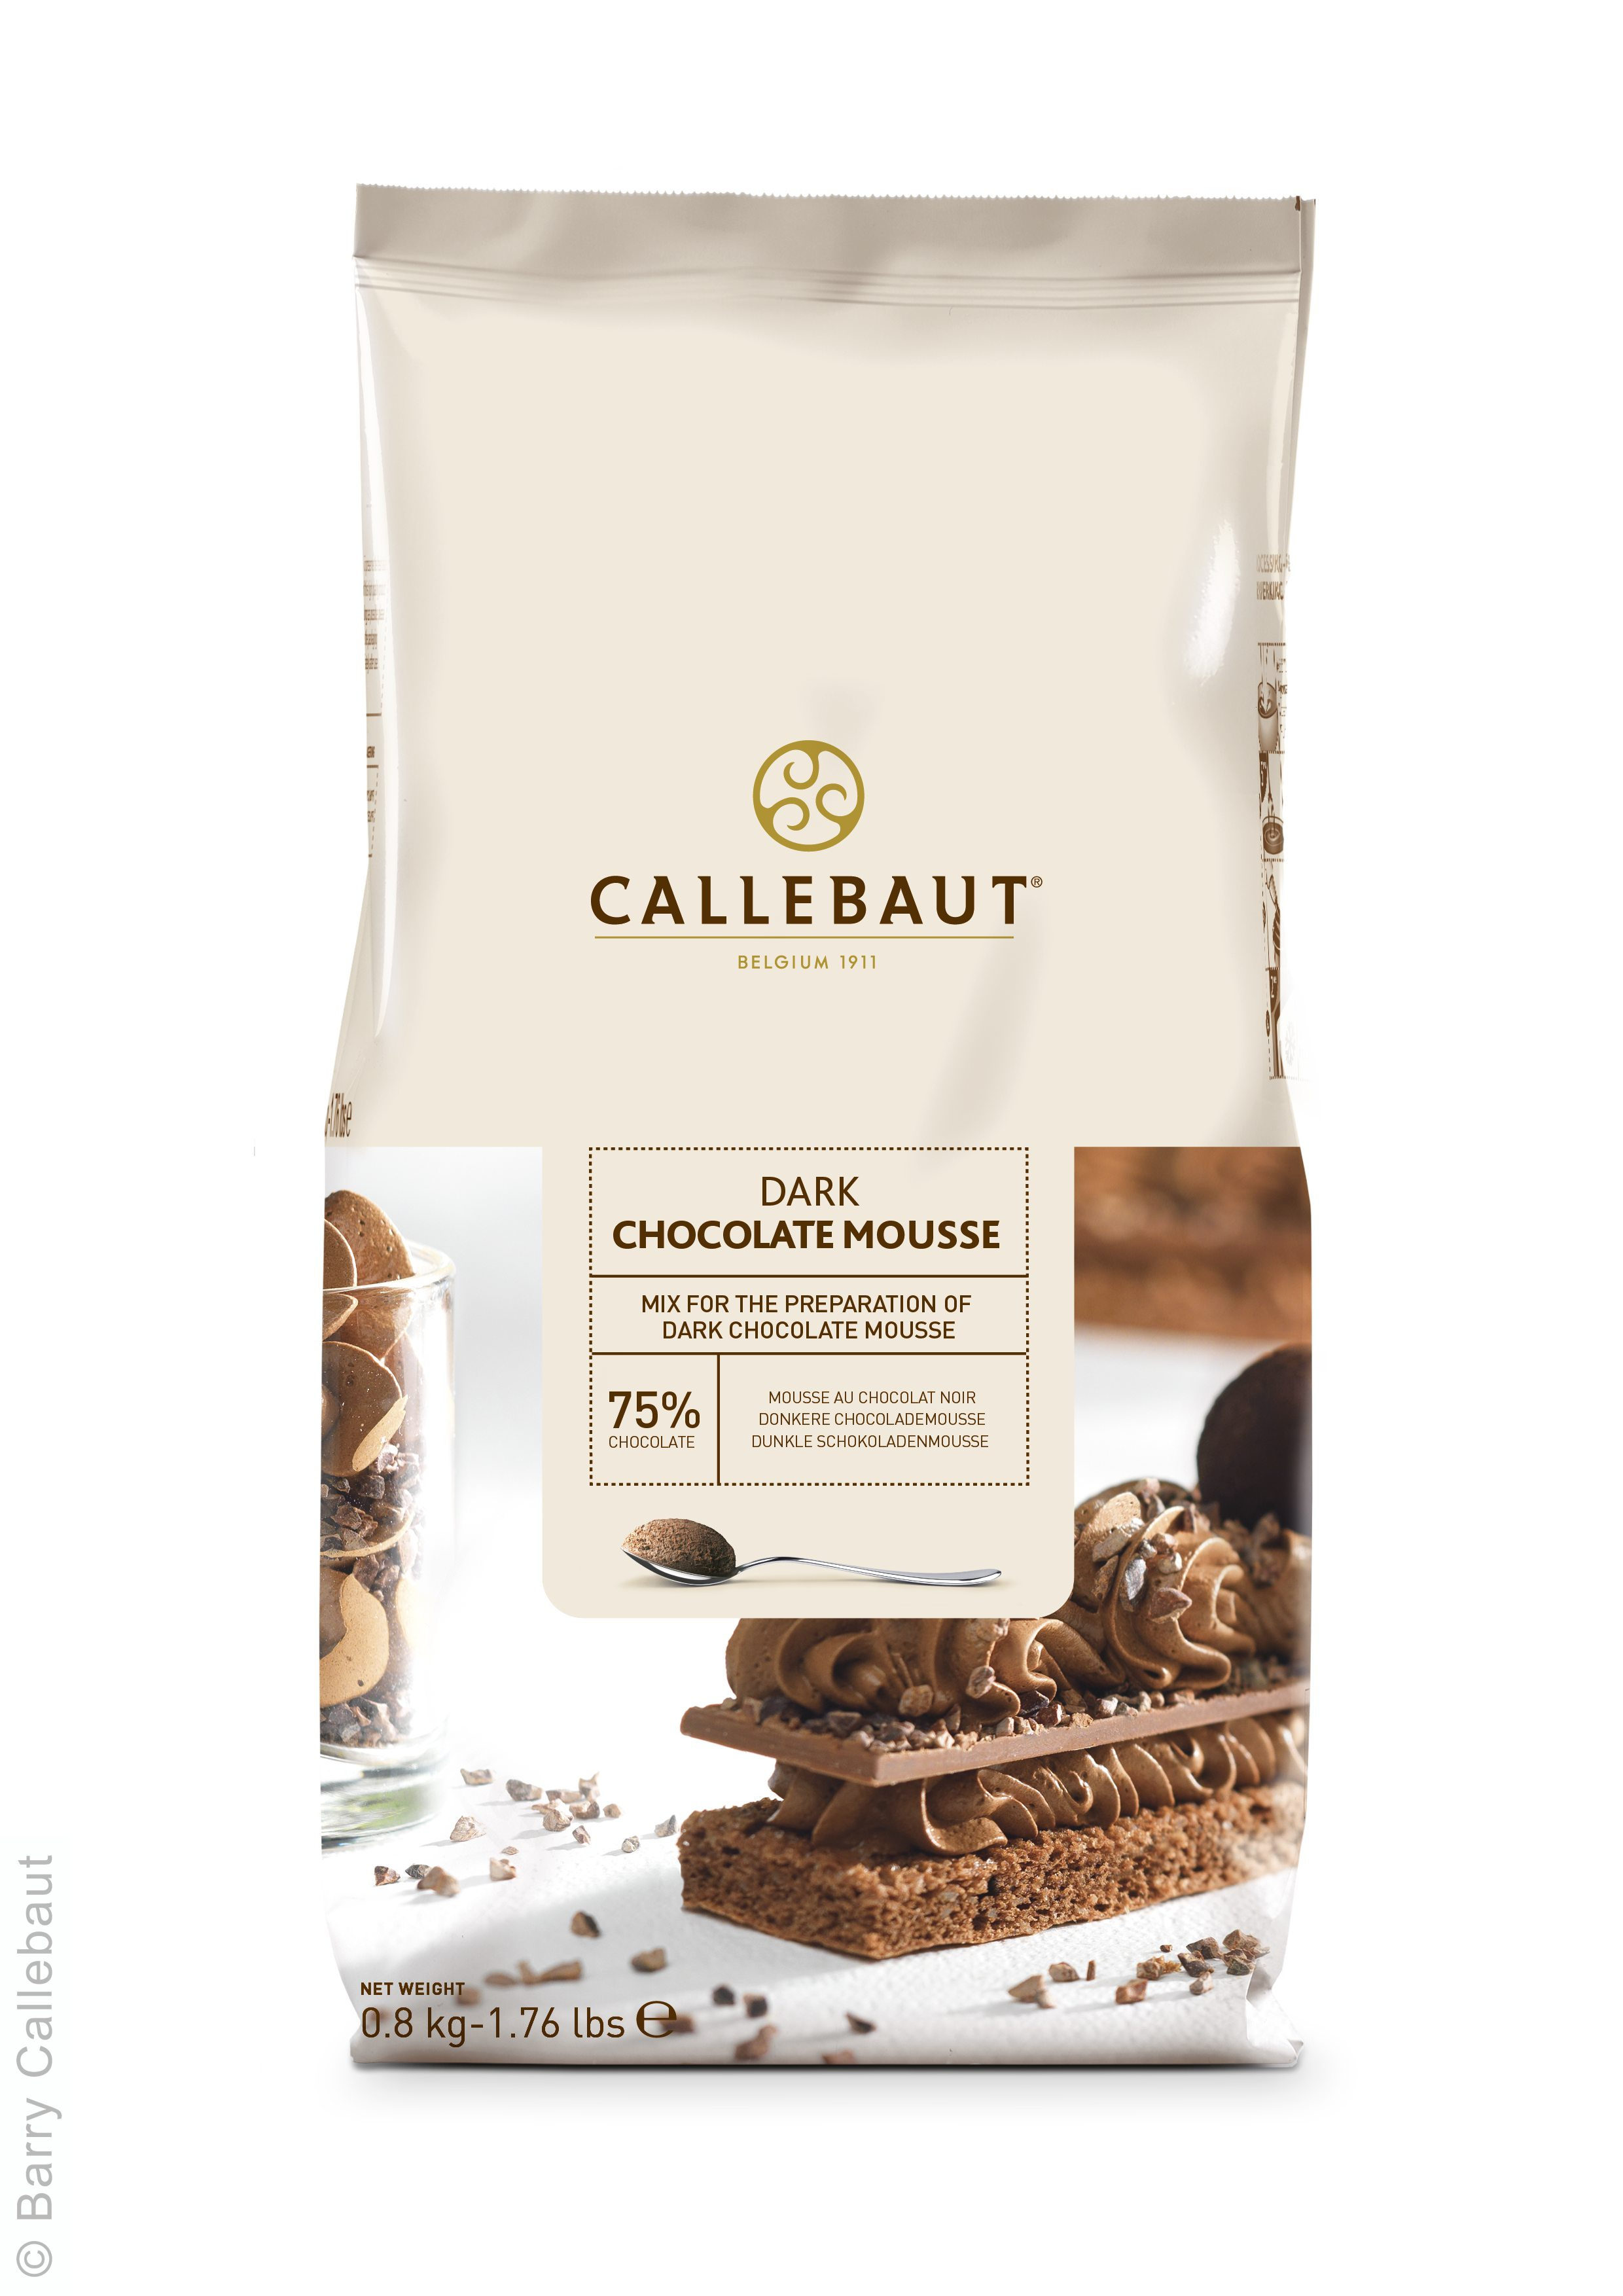 Callebaut Chocolate Mousse 1.76 lbs - Divine Specialties